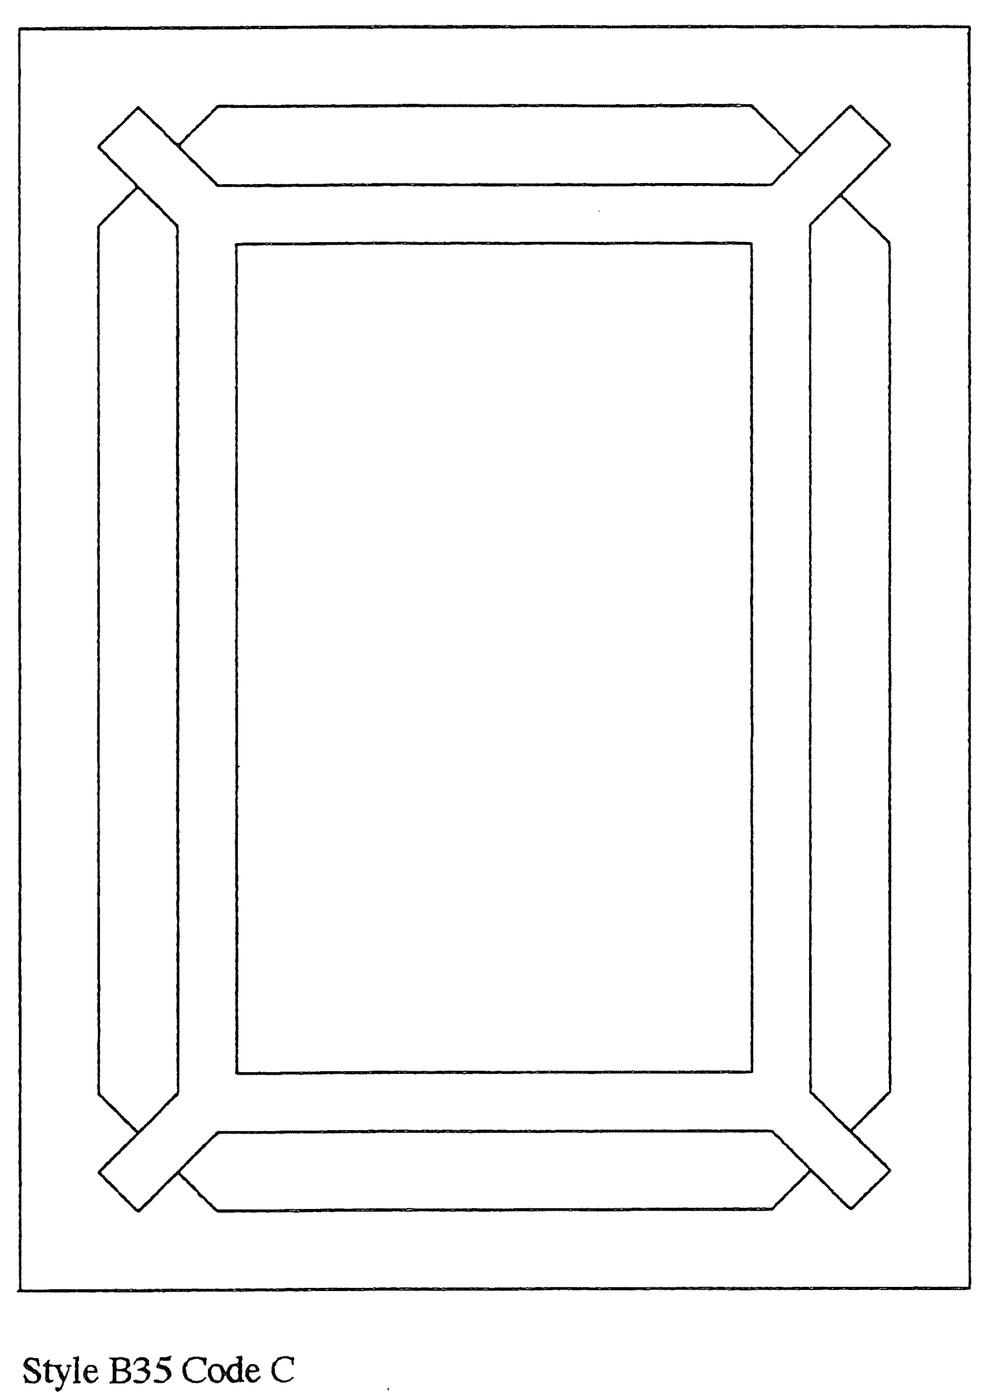 P6-B35.jpg